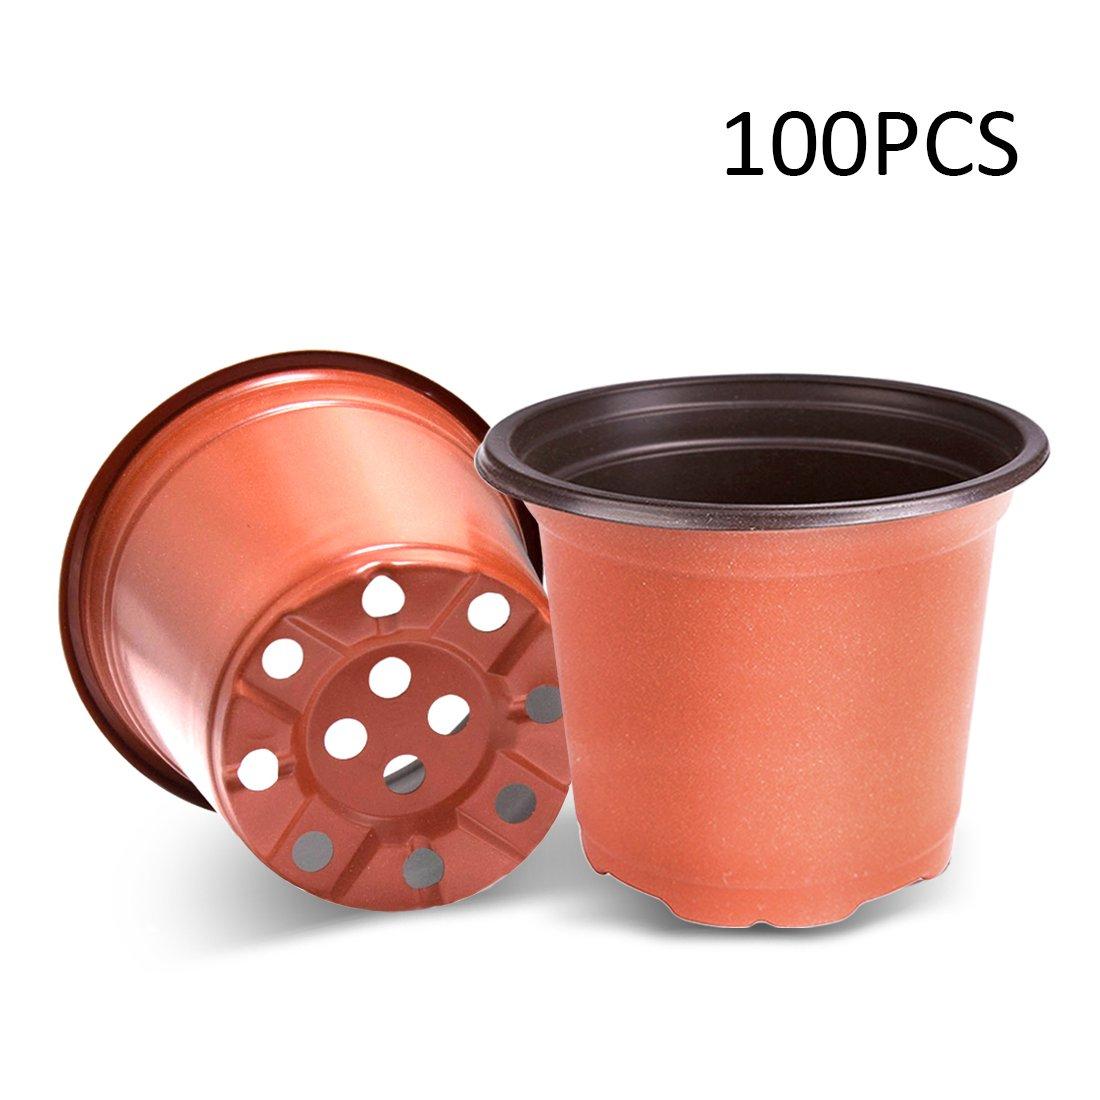 VIVOSUN 100-PACK 6'' Plastic Plants Flower Seedling Nursery Pot - Lightweight, Washable, Reusable